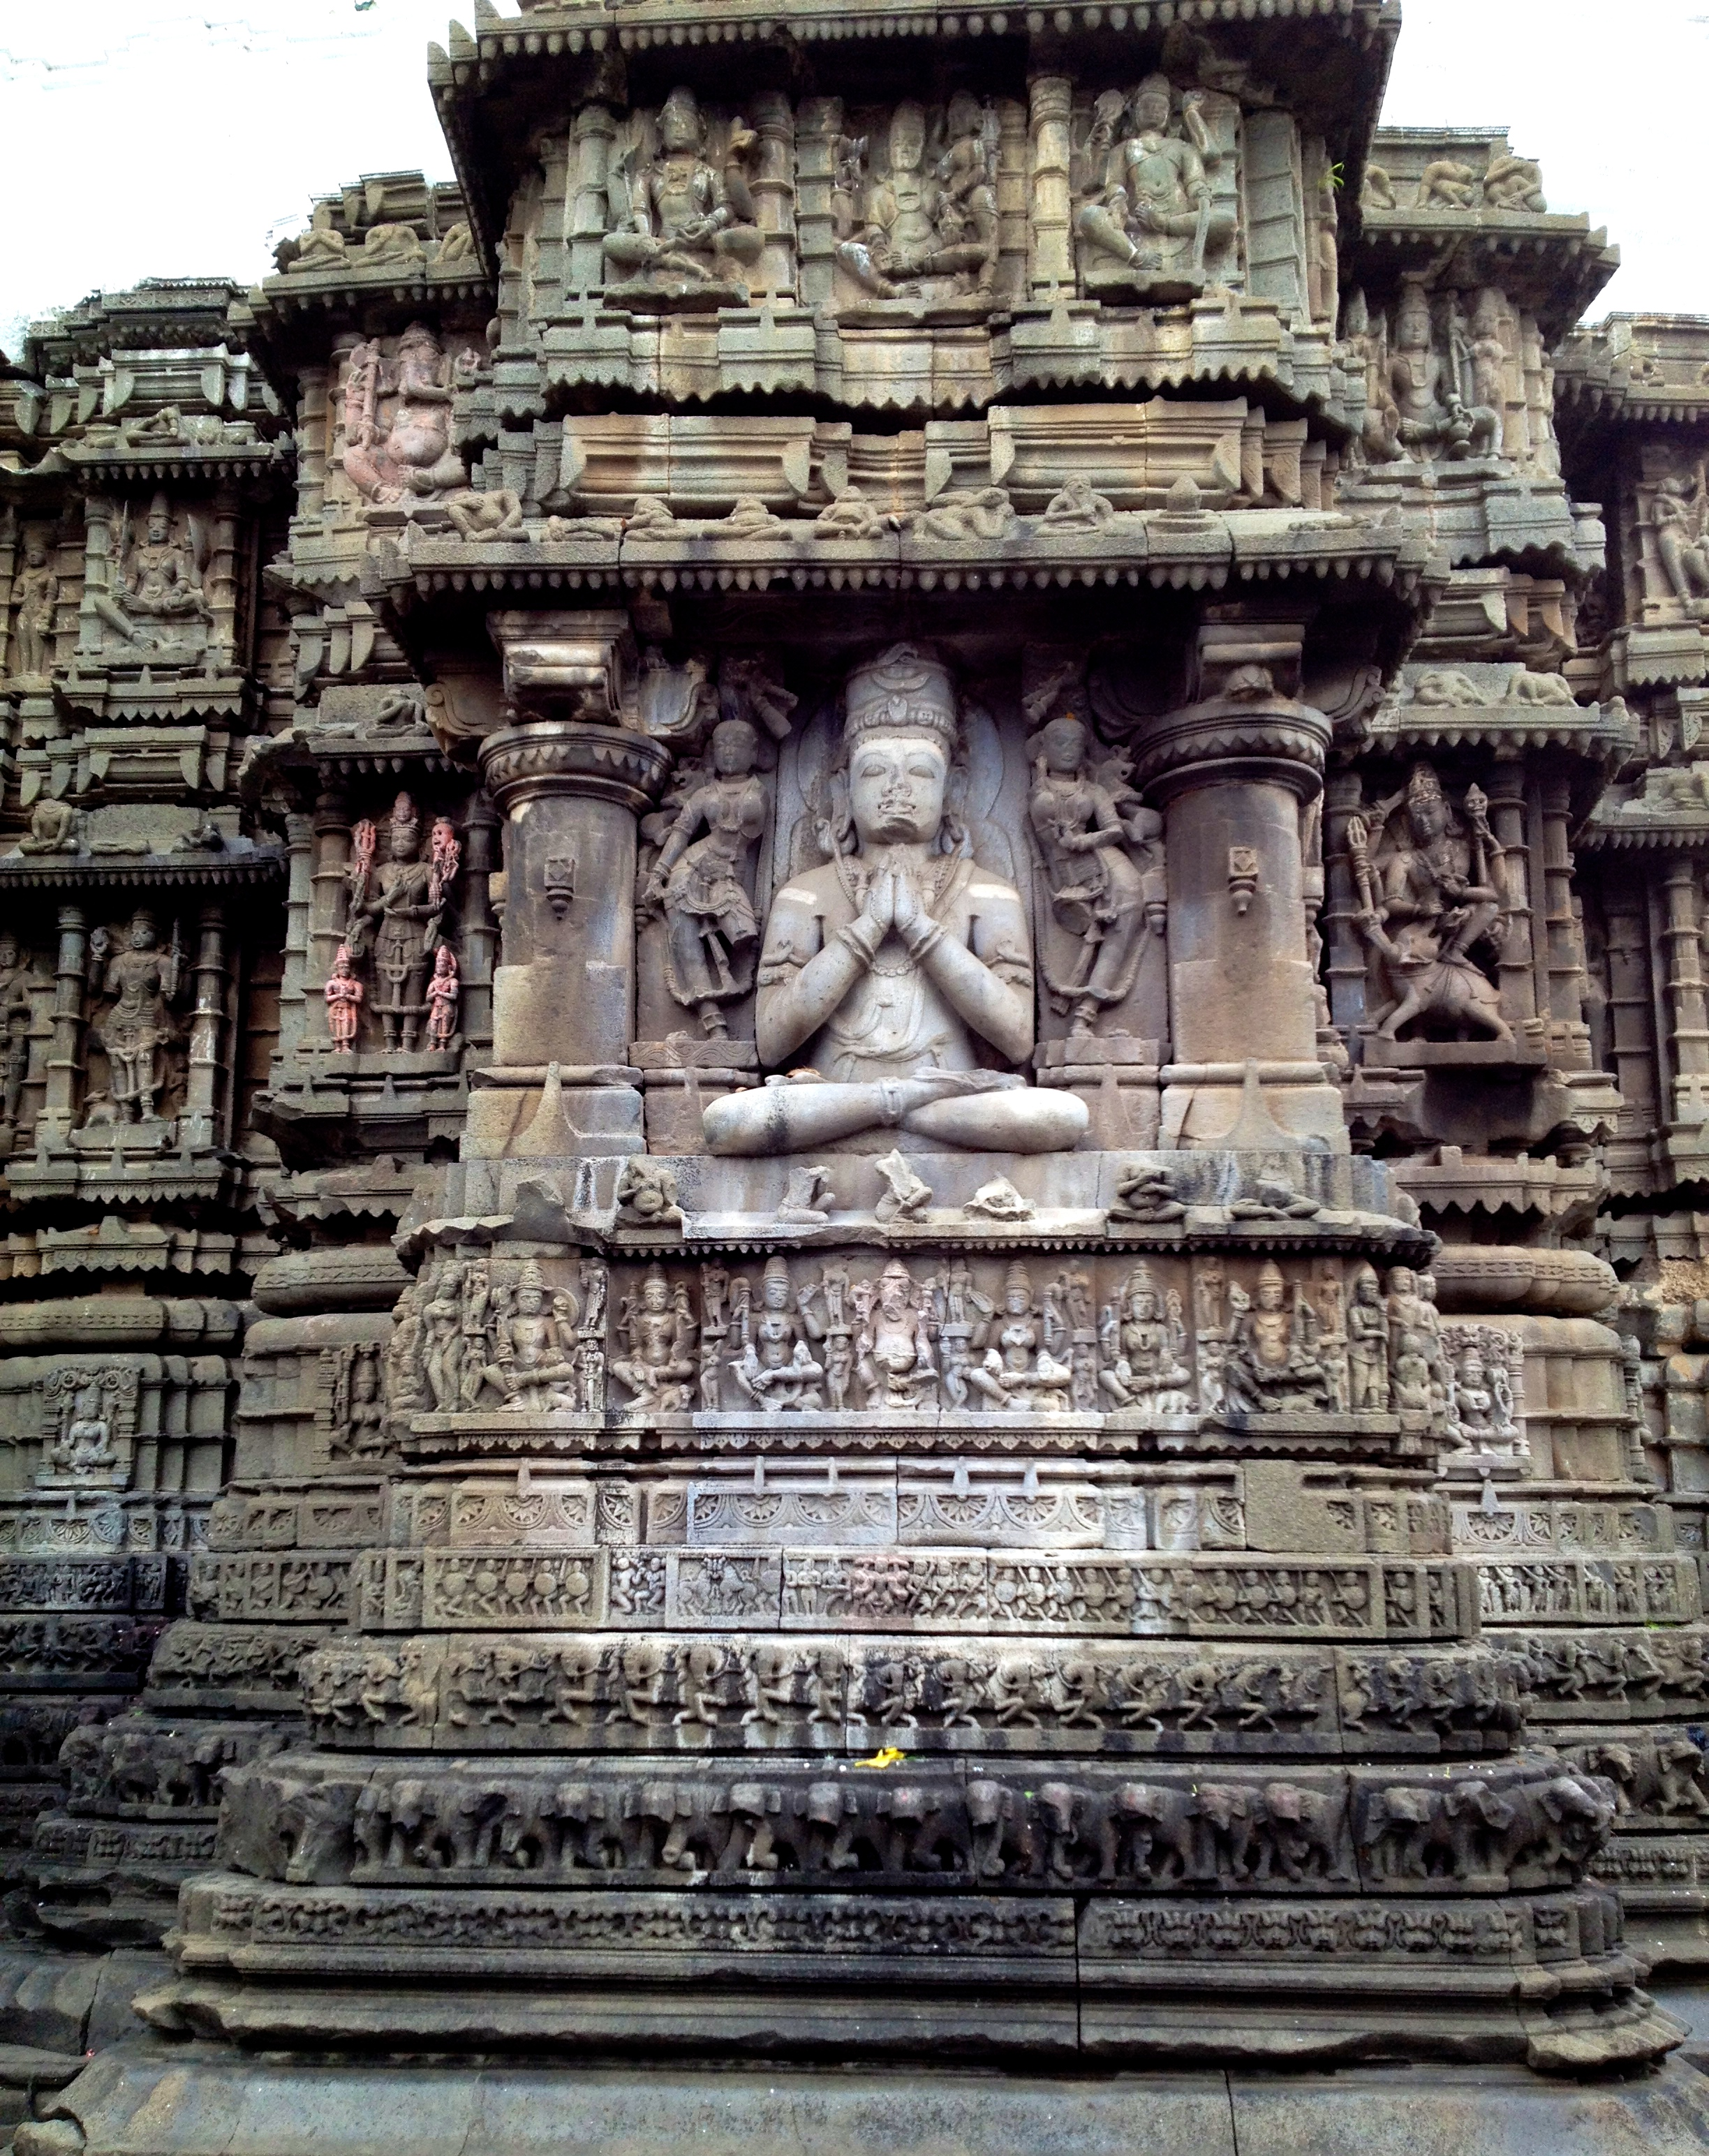 Mysterious Temples In World: File:Aundha Nagnath Shiva Temple Jyotirlinga Maharashtra